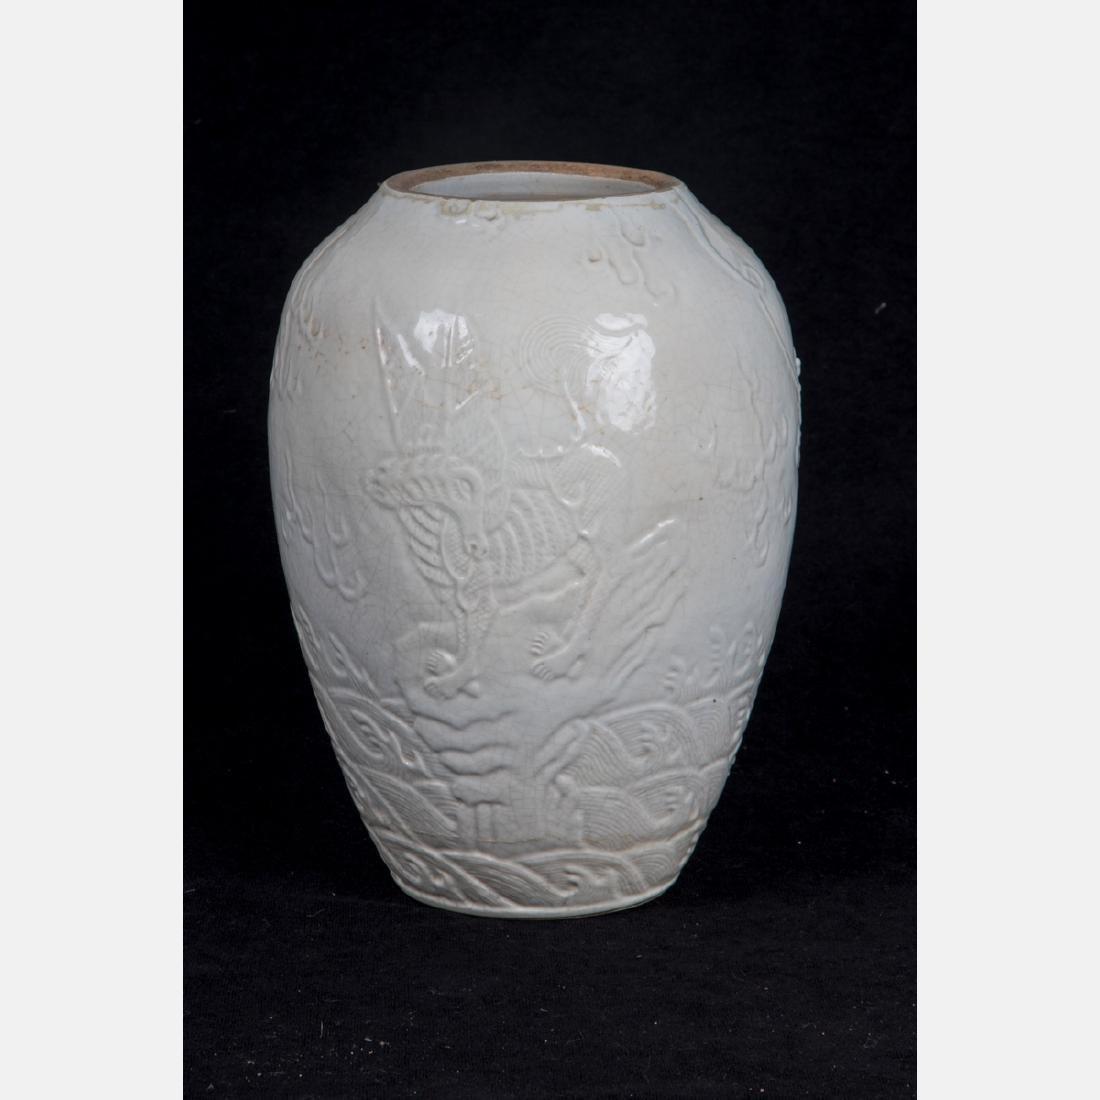 A Chinese Porcelain Blanc de Chine Vase, 20th Century,